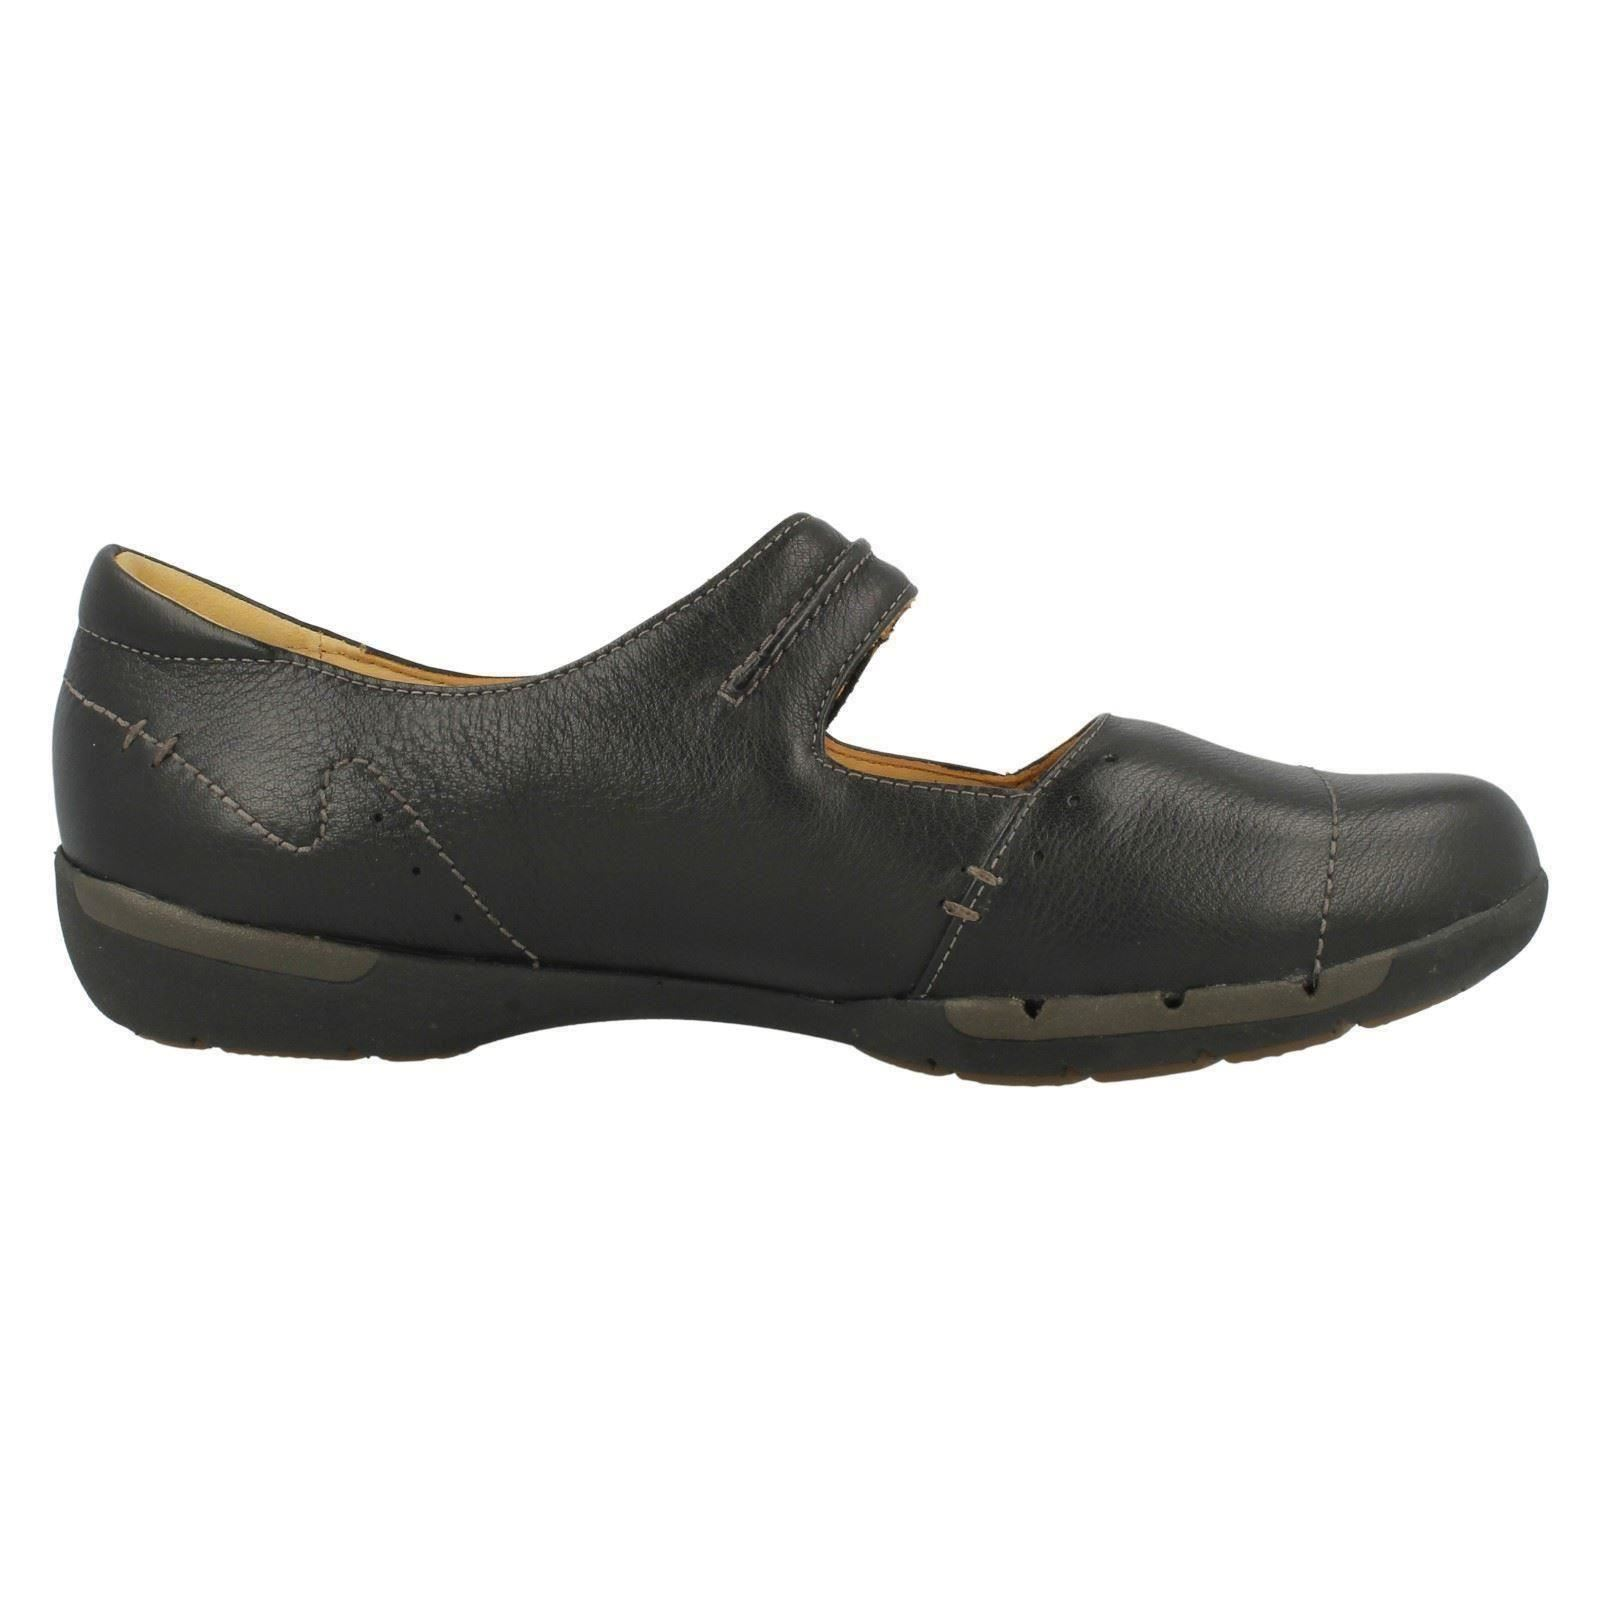 Ladies-Clarks-Unstructured-Flat-Shoes-Un-Helma